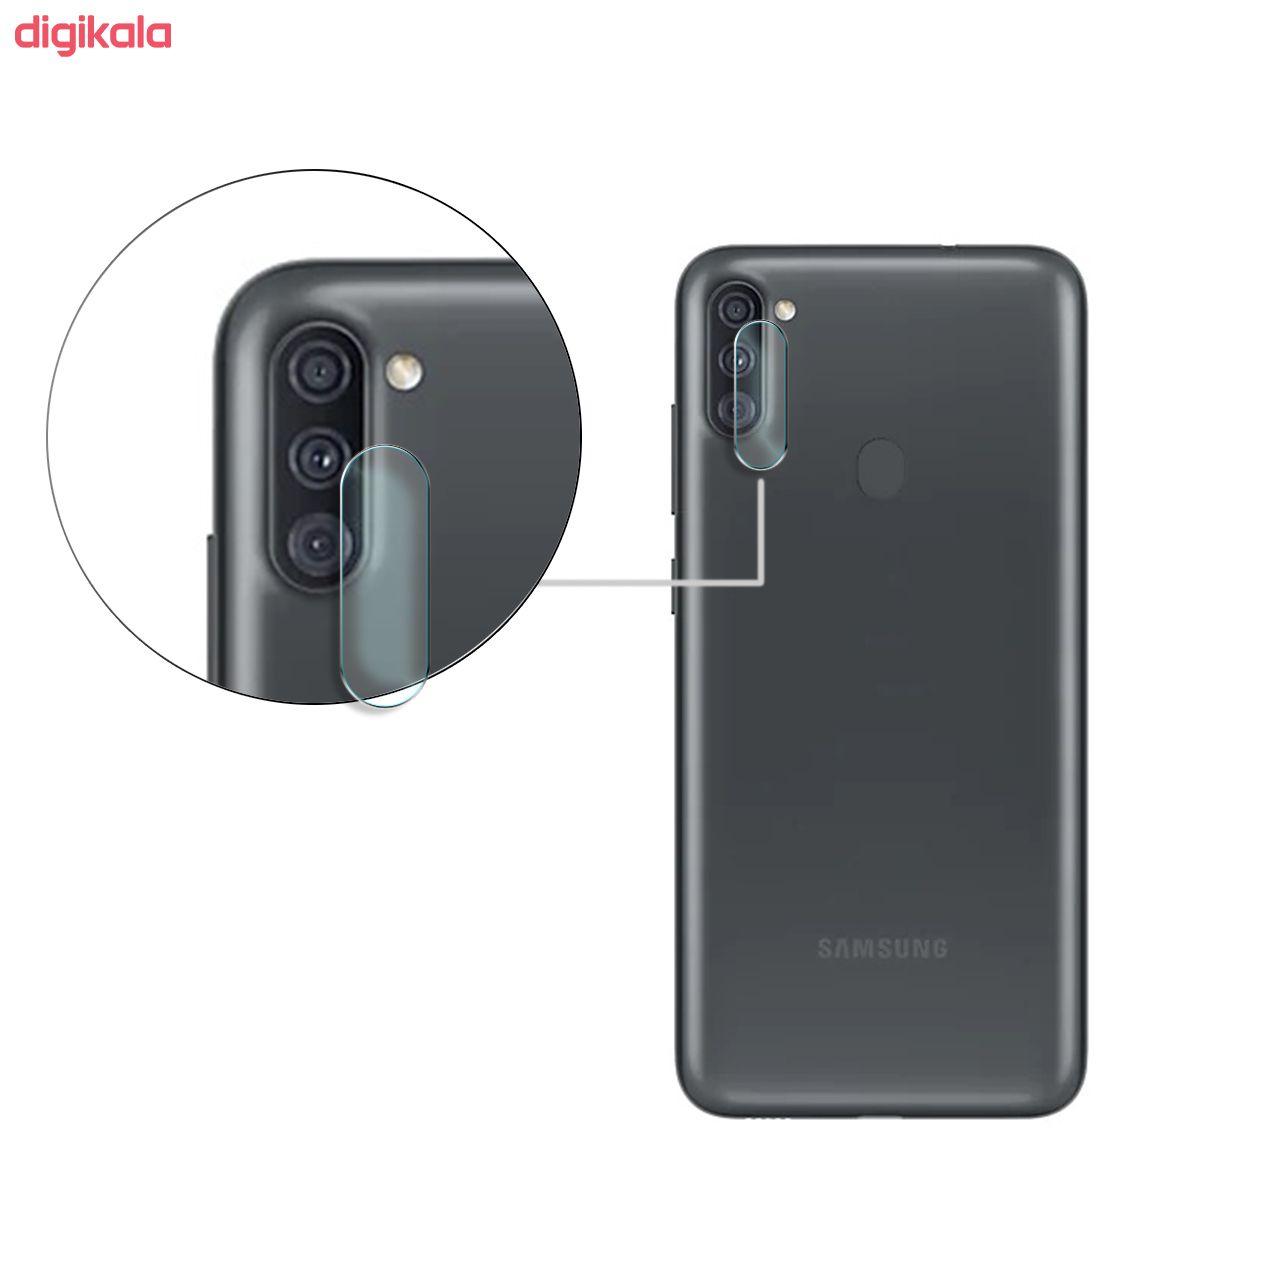 محافظ لنز دوربین سیحان مدل GLP مناسب برای گوشی موبایل سامسونگ Galaxy A11 main 1 1